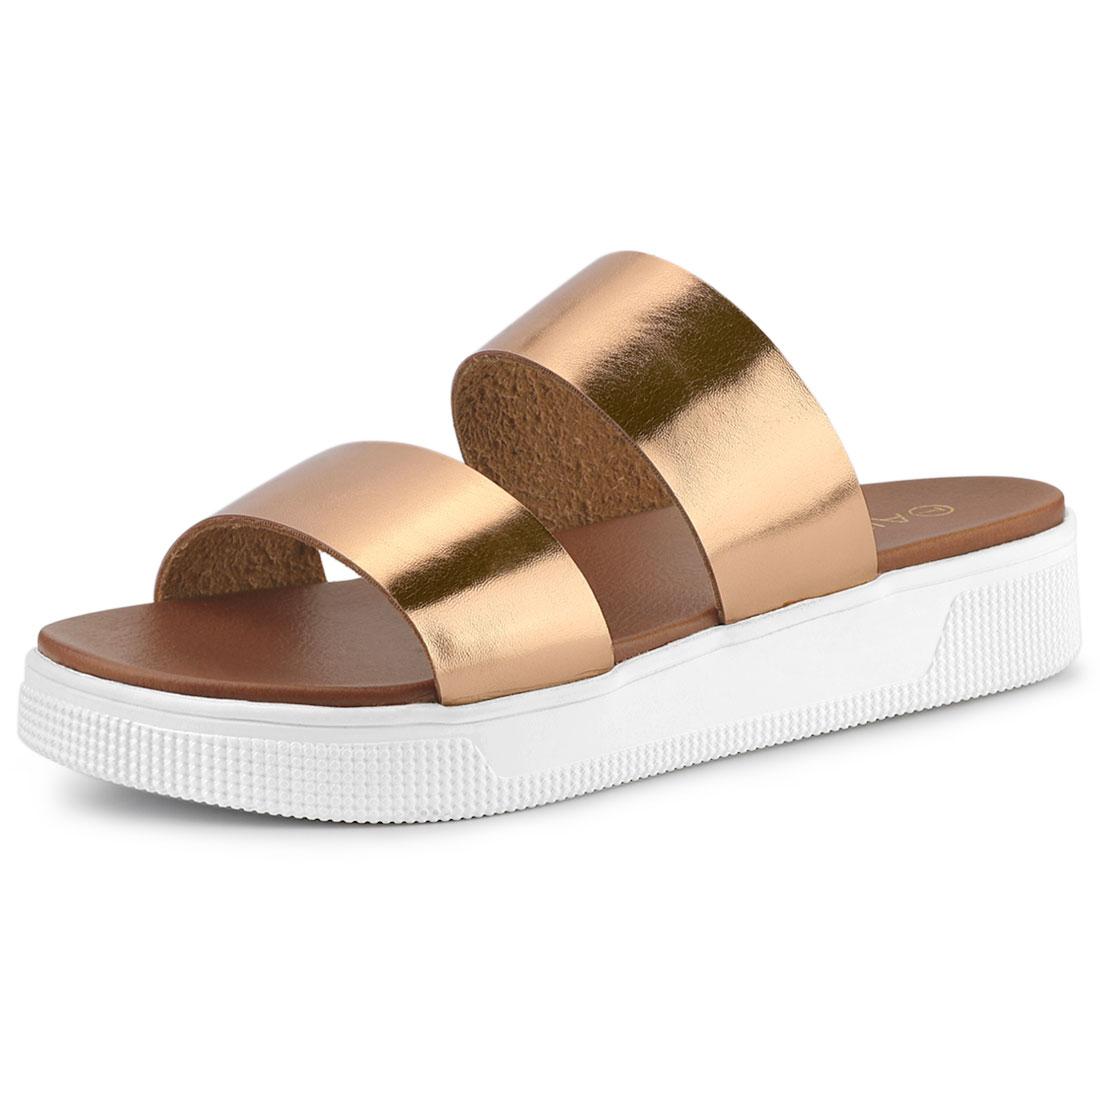 Allegra K Women's Open Toe Flatform Slides Sandals Rose Gold US 8